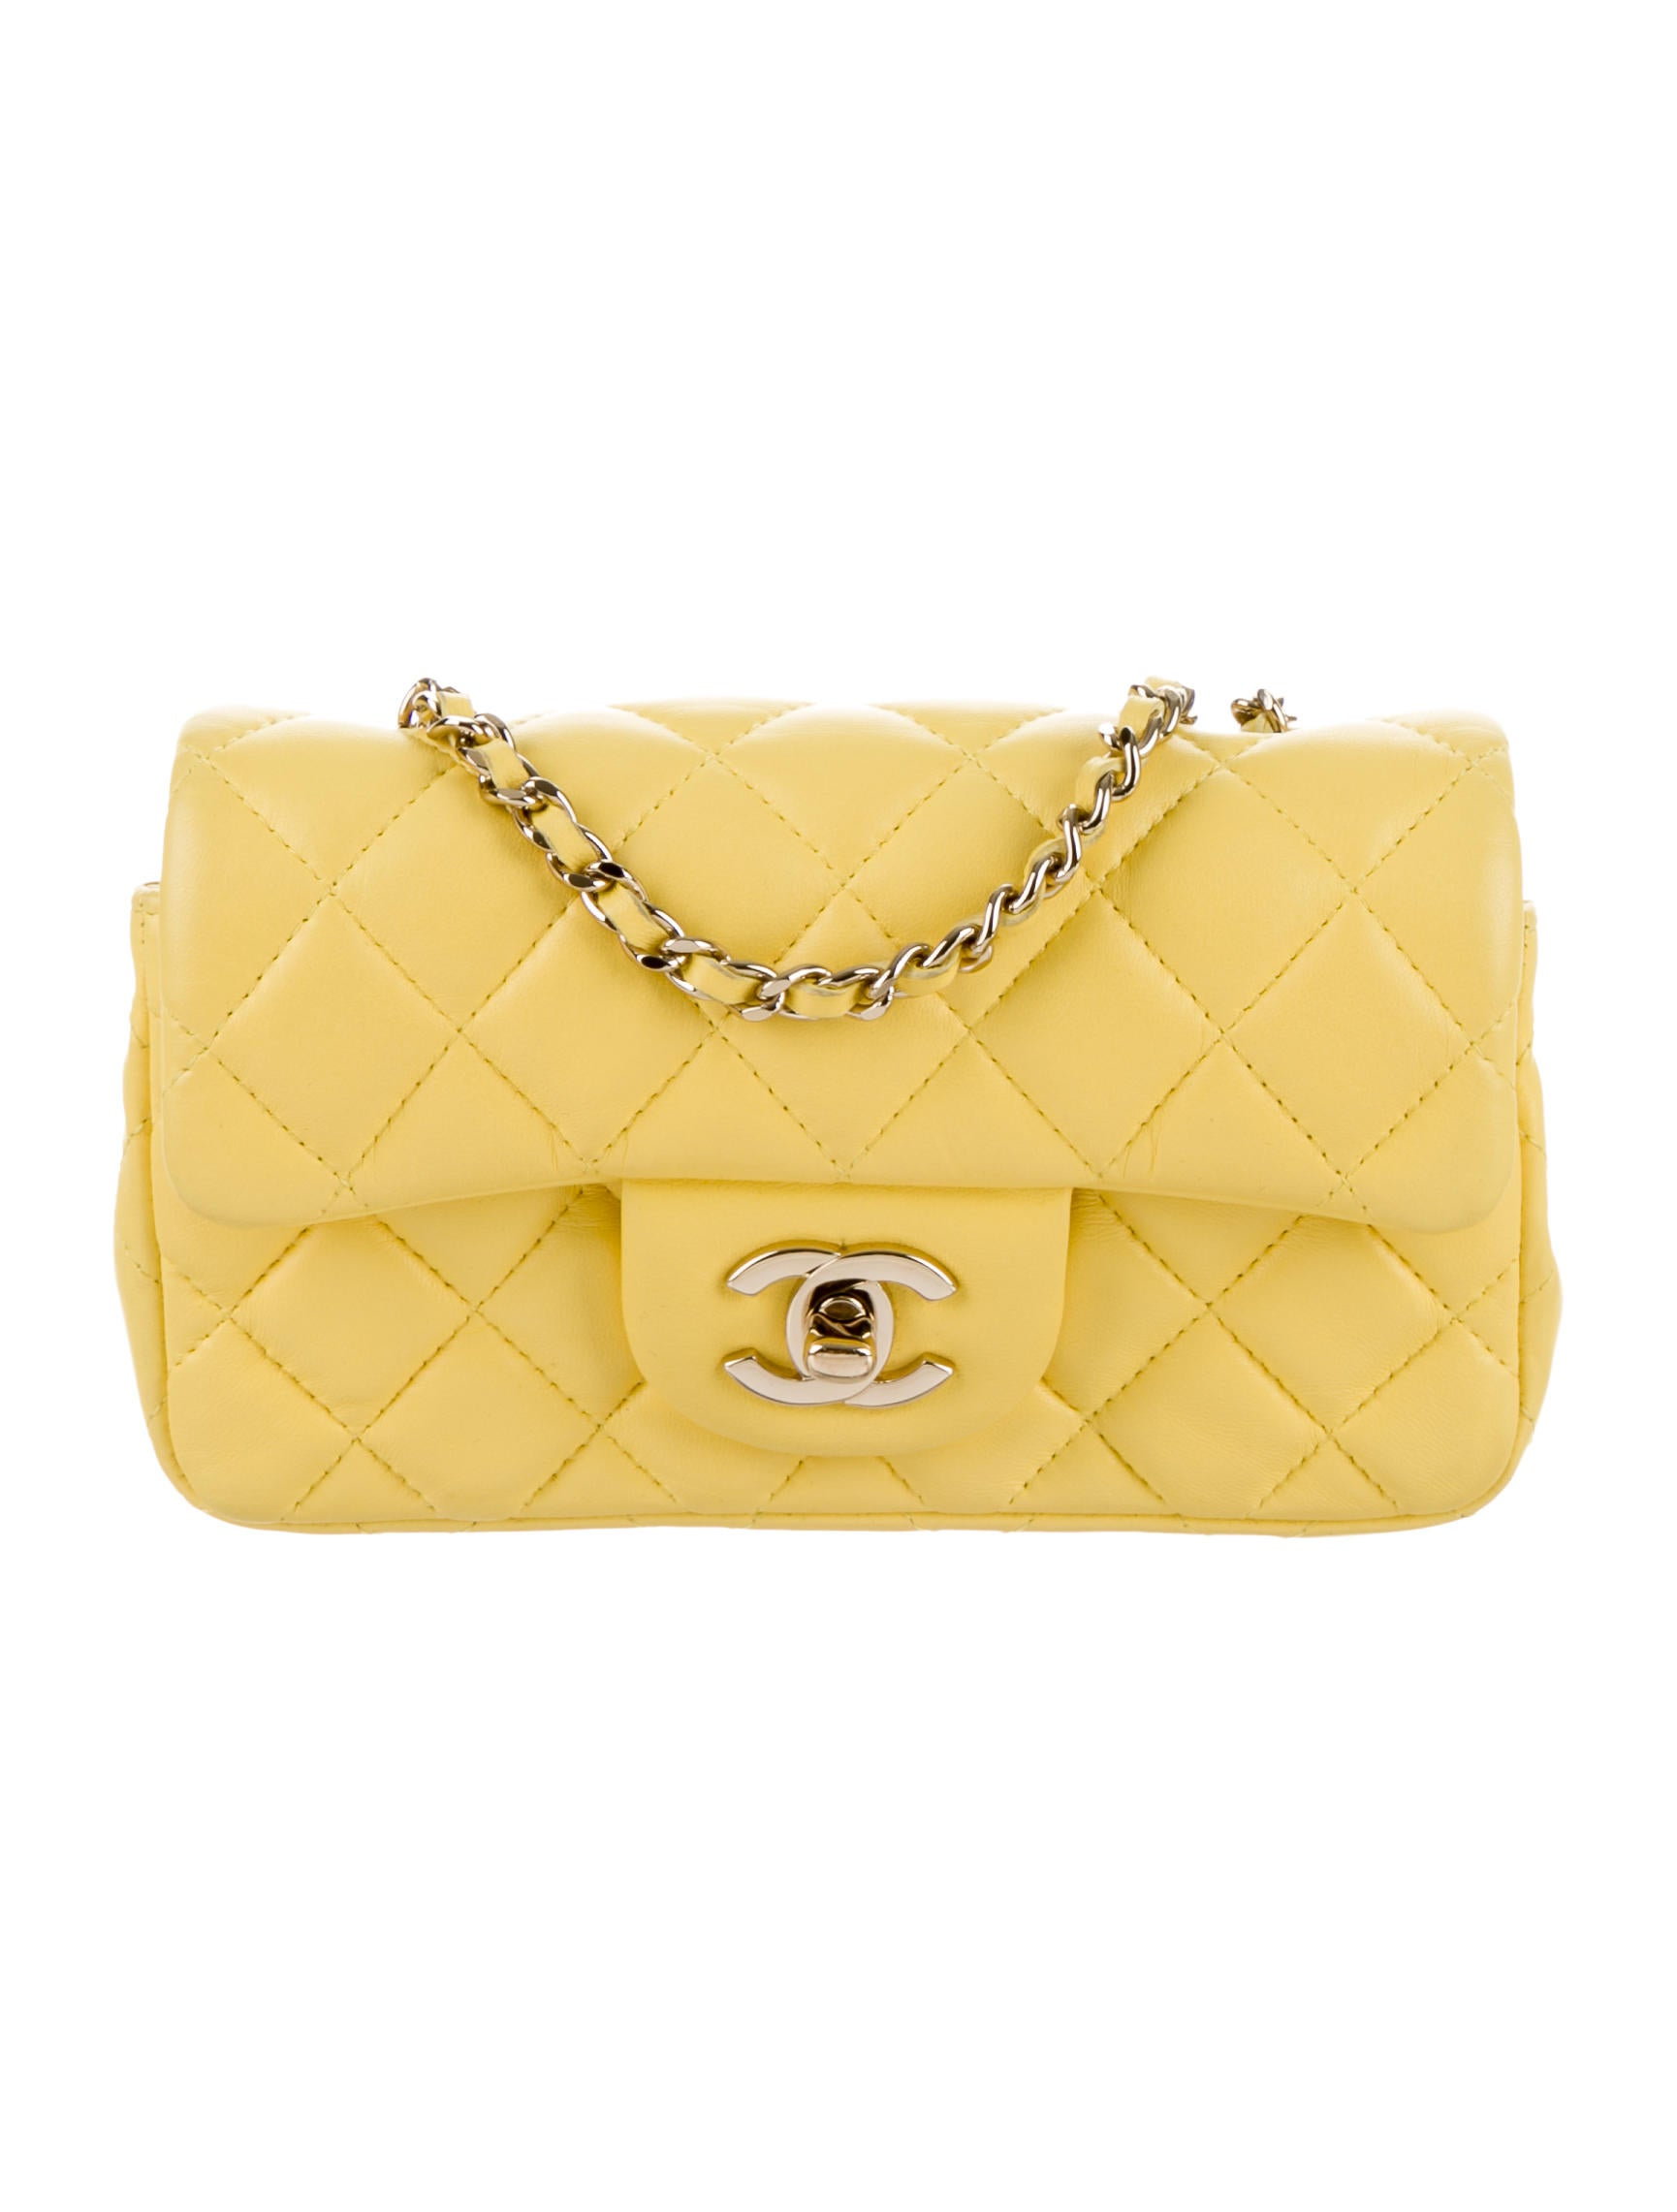 5c33b8b53bf4 Chanel Extra Mini Classic Flap Bag - Handbags - CHA105206 | The RealReal